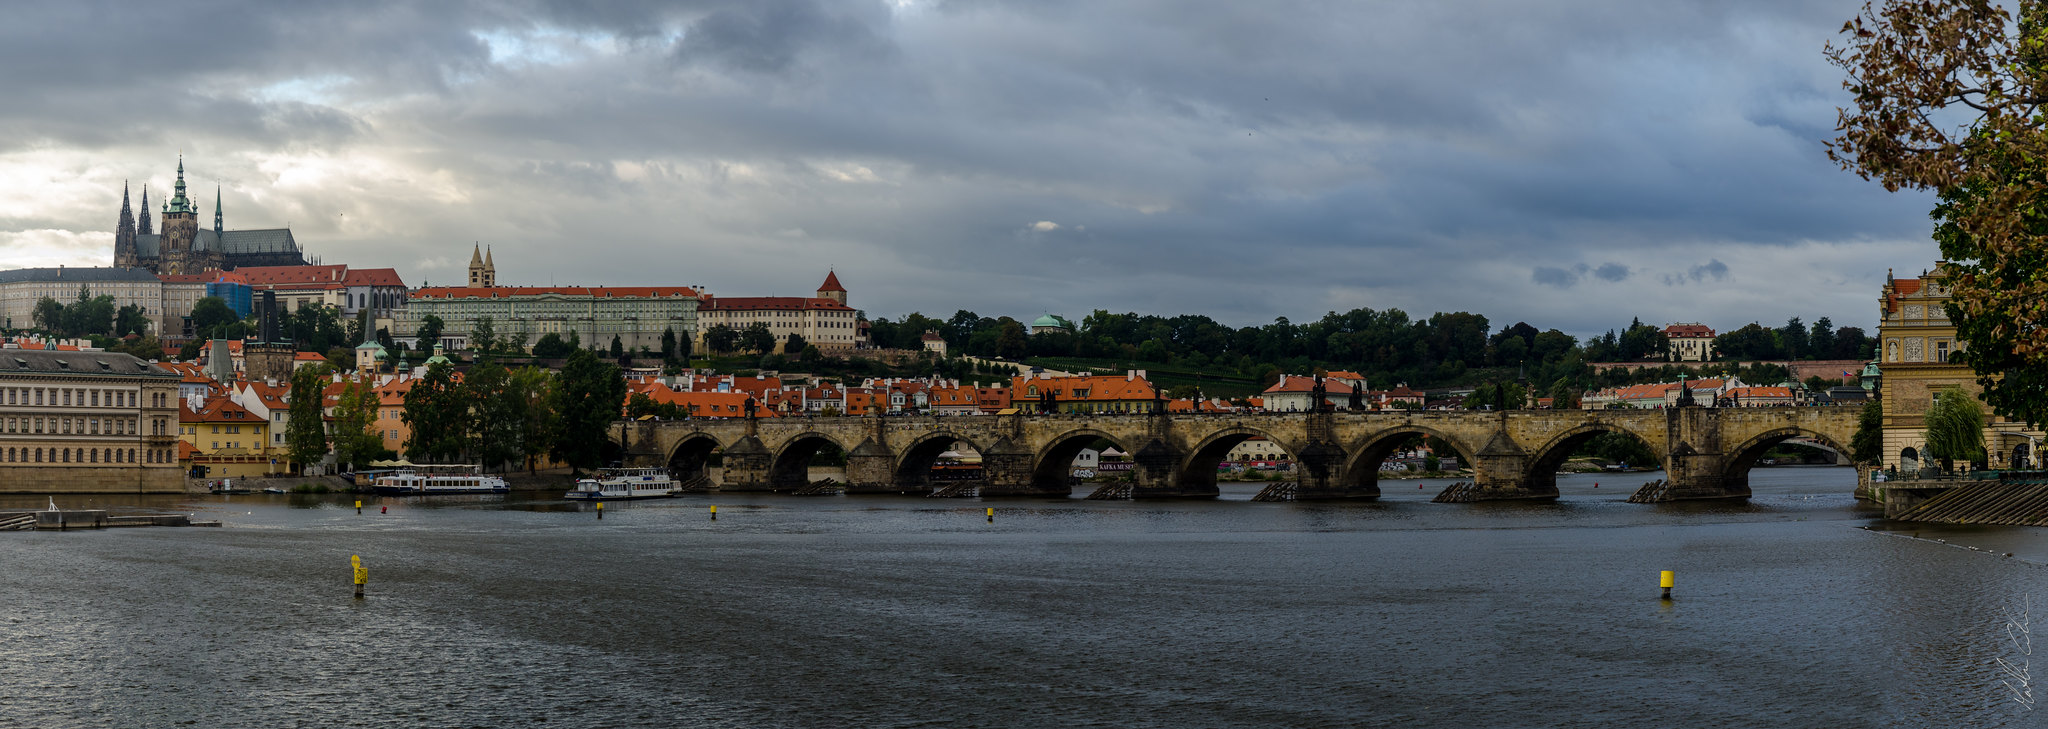 PragueVienneBudapest-Flickr-4